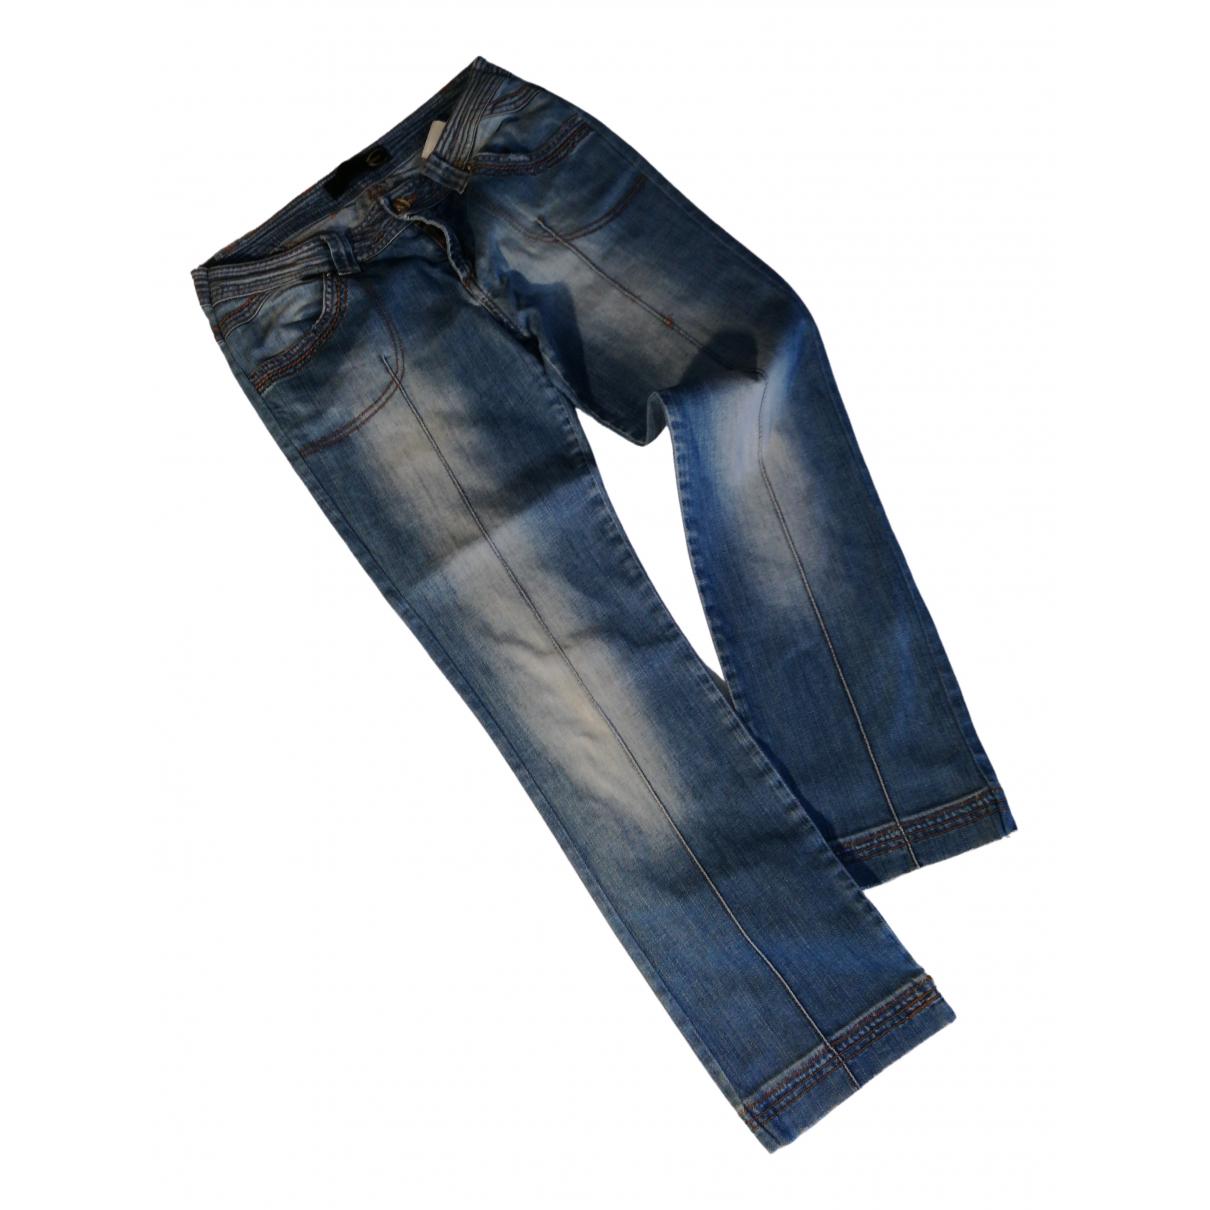 Just Cavalli \N Blue Denim - Jeans Trousers for Women 44 IT